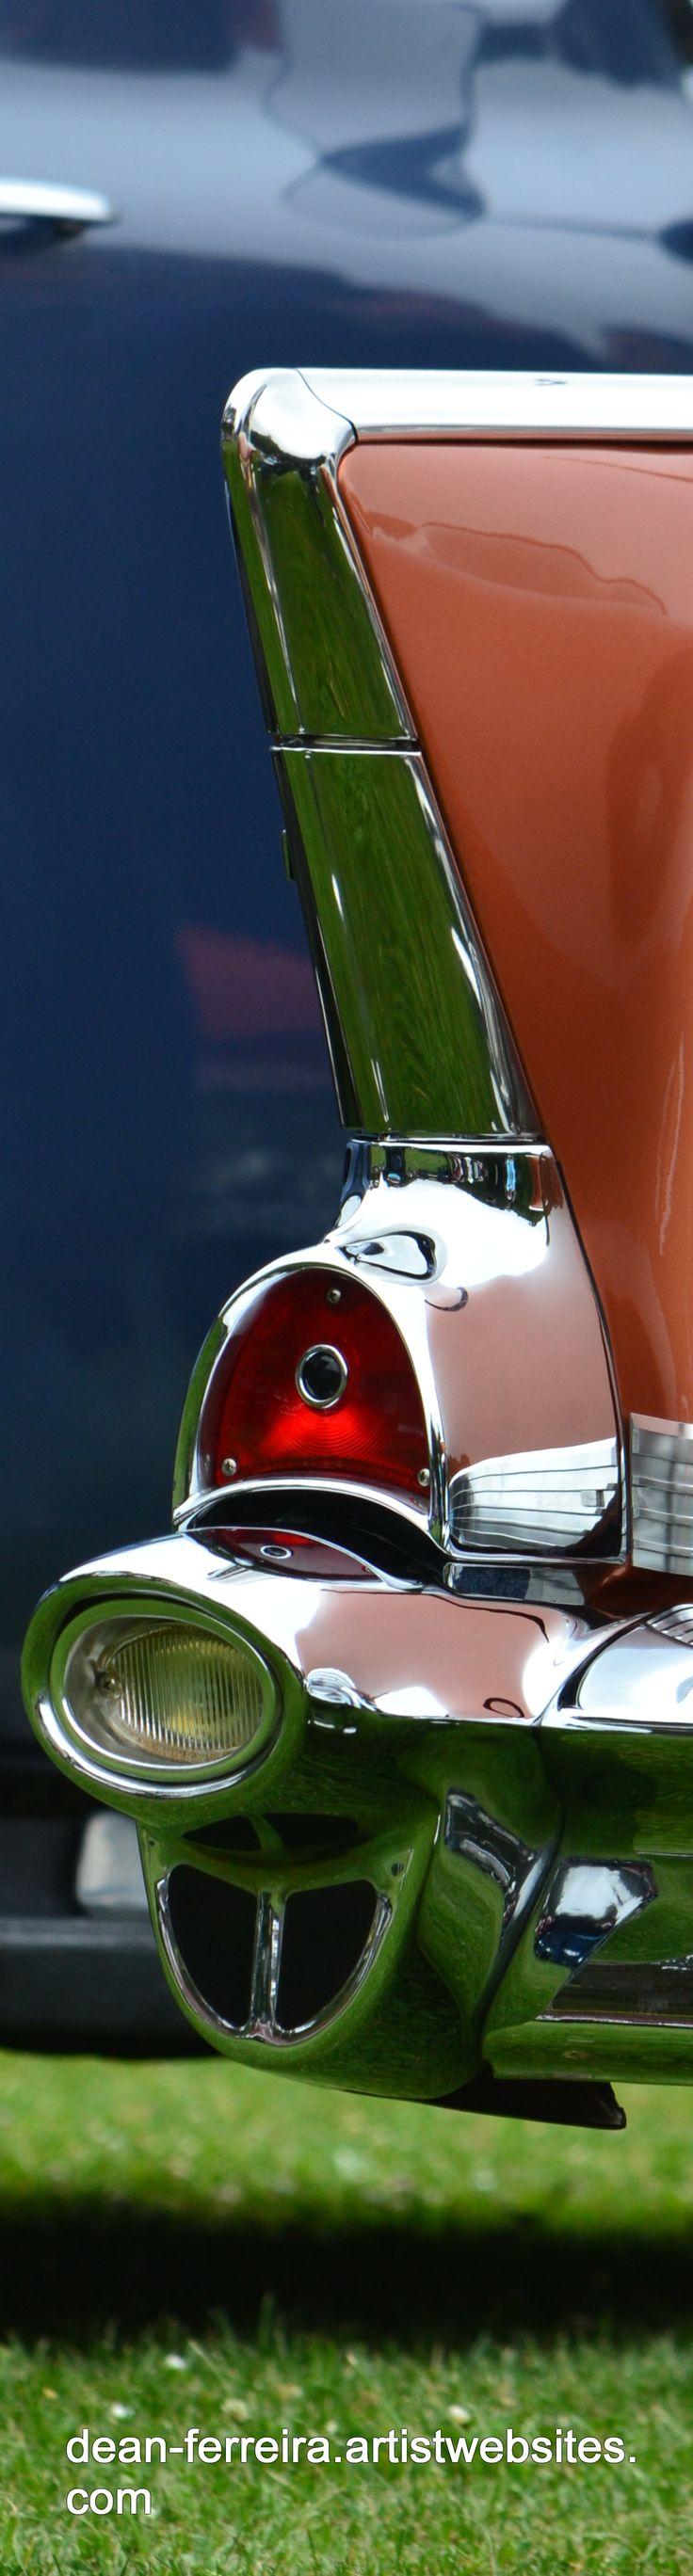 1956 chevrolet belair mjc classic cars pristine - Chevy